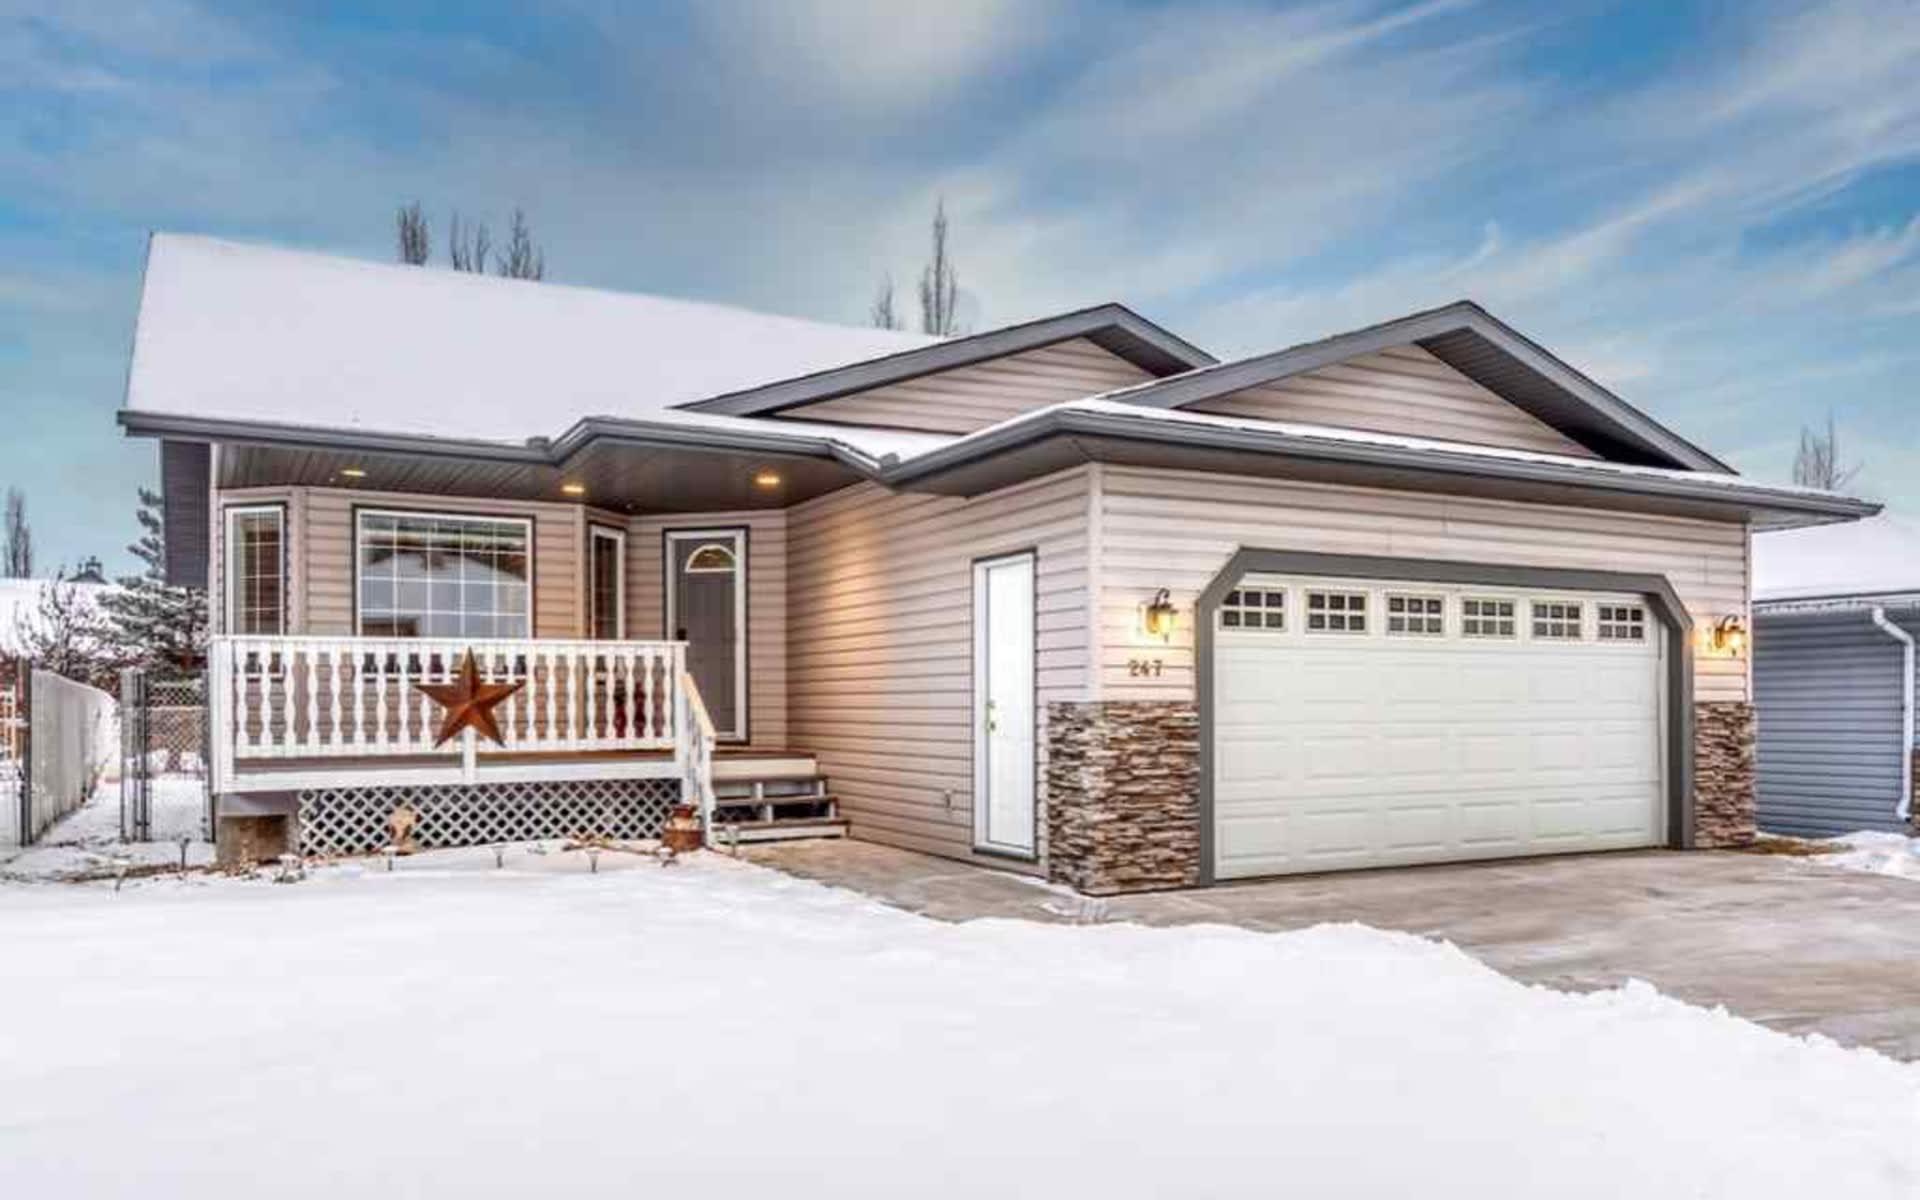 Sneak A Peek at 247 Cambridge Crescent in Strathmore, Alberta video preview